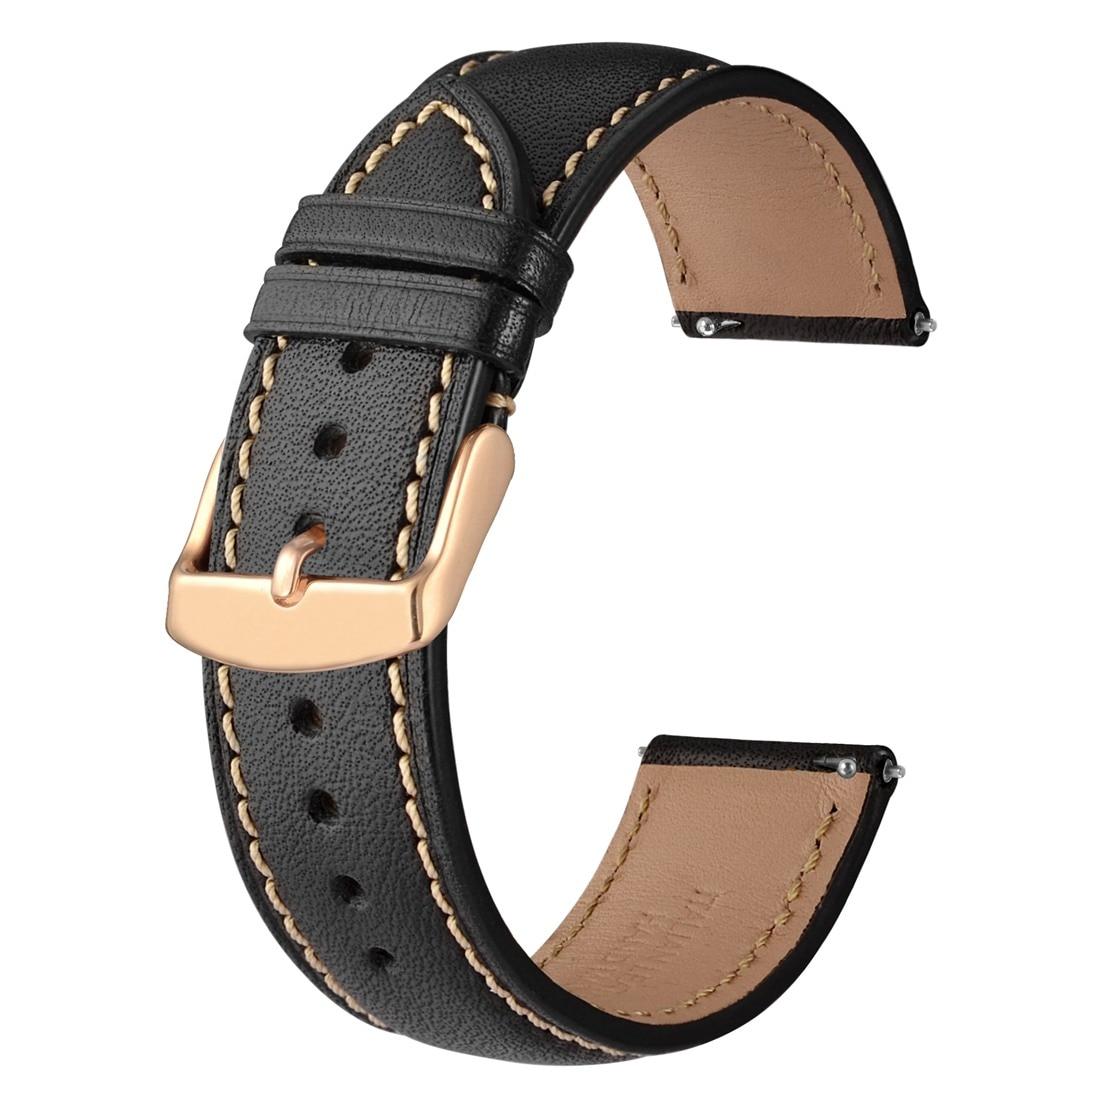 couro genuíno pulseira de relógio com ouro rosa fivela para galaxy